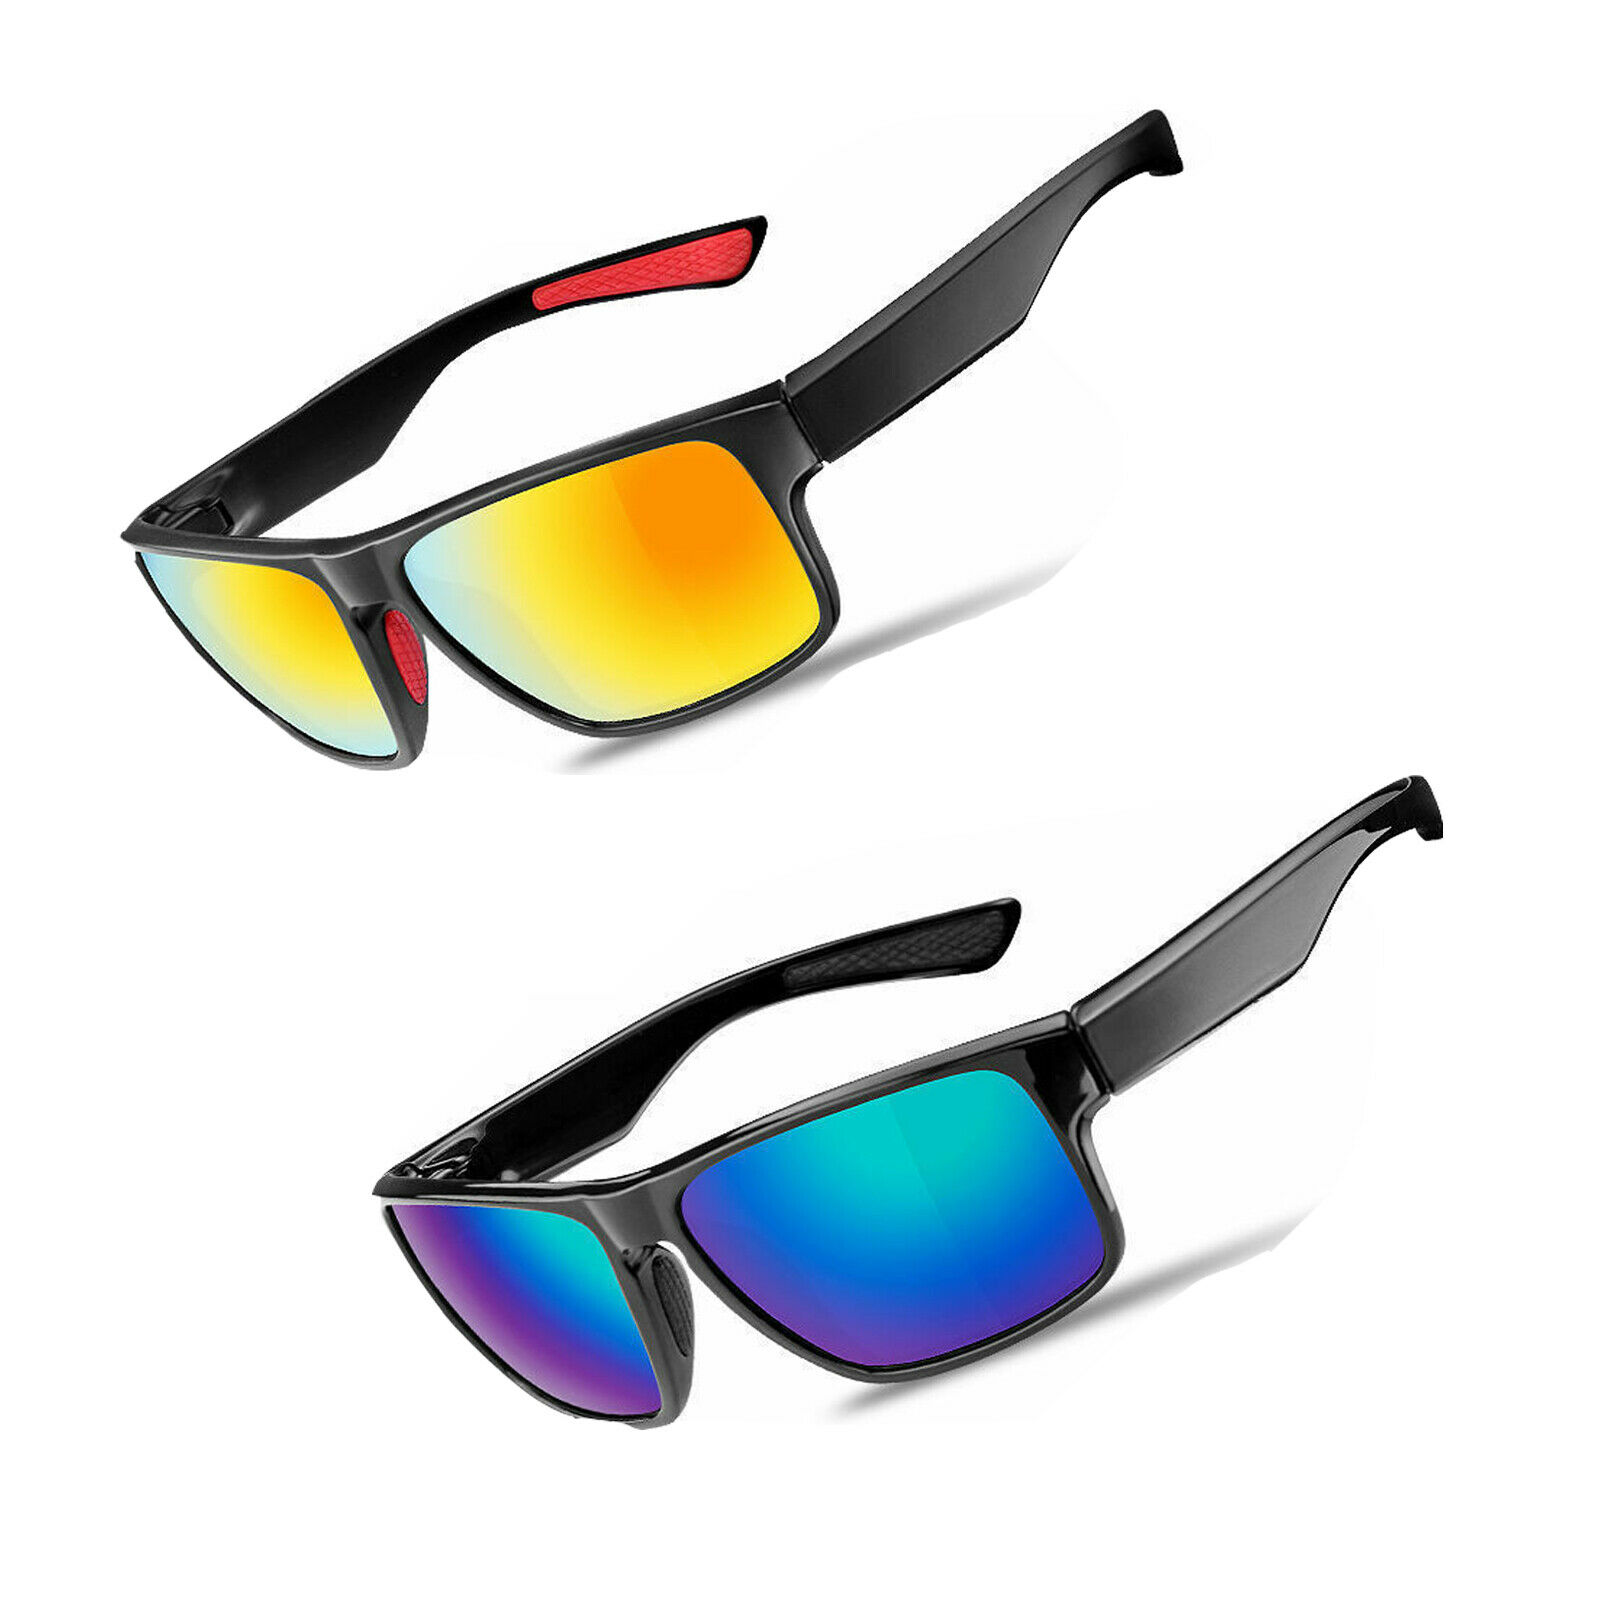 ROCKBROS Fahrradbrille Polarisierte Sonnenbrille Fahrrad Brille Radbrille UV400